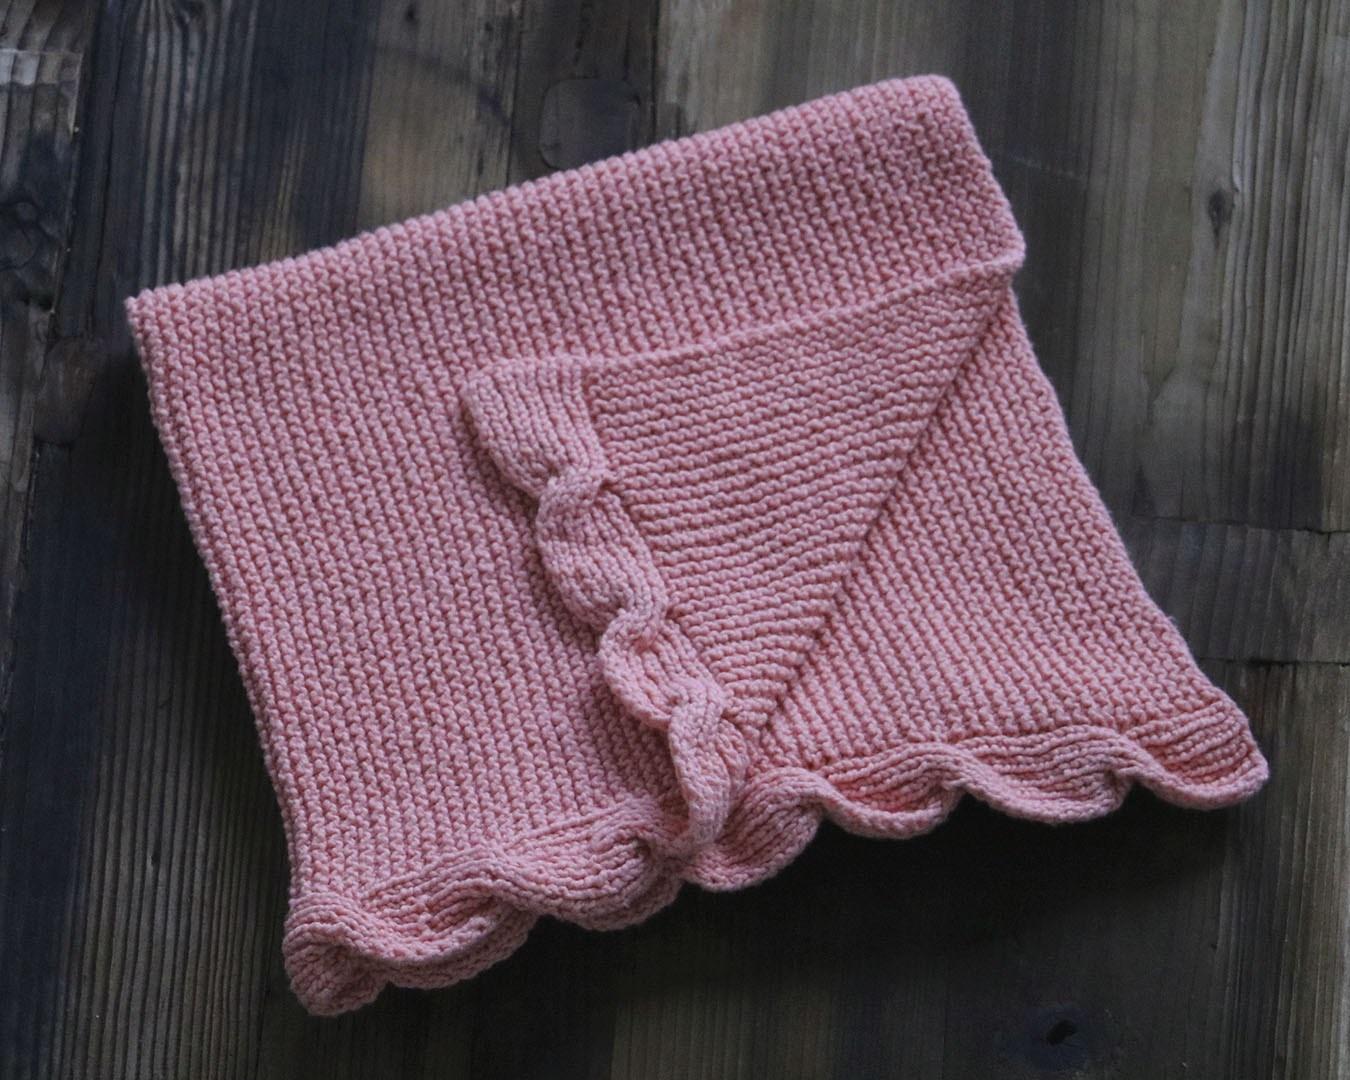 Lola Baby Blanket Knitting Pattern | Originally Lovely - Free Printable Knitting Patterns For Baby Blankets